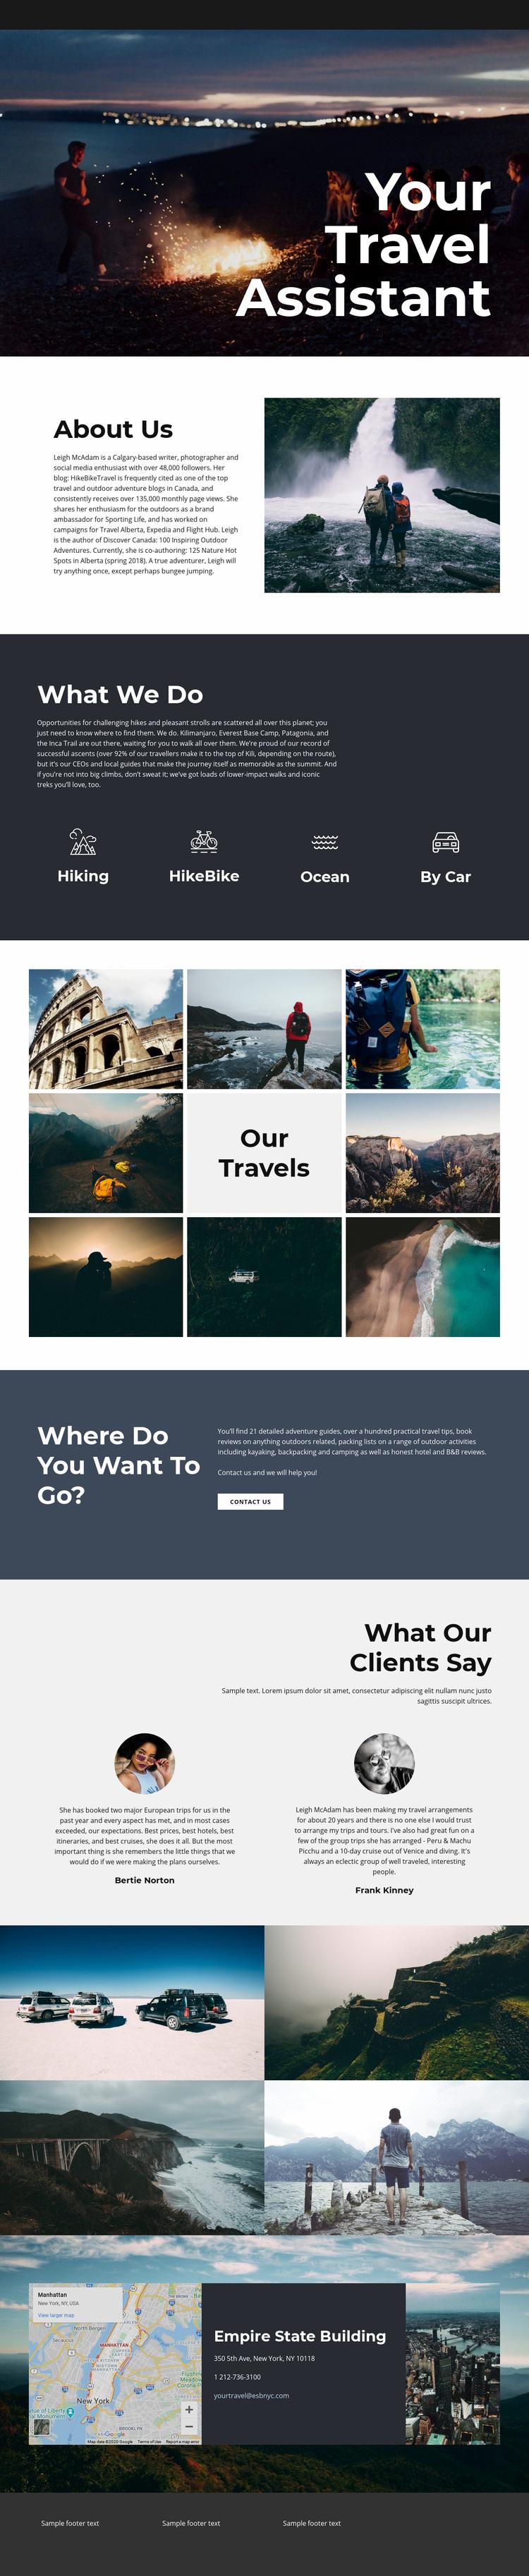 Travel Assistant Web Page Designer